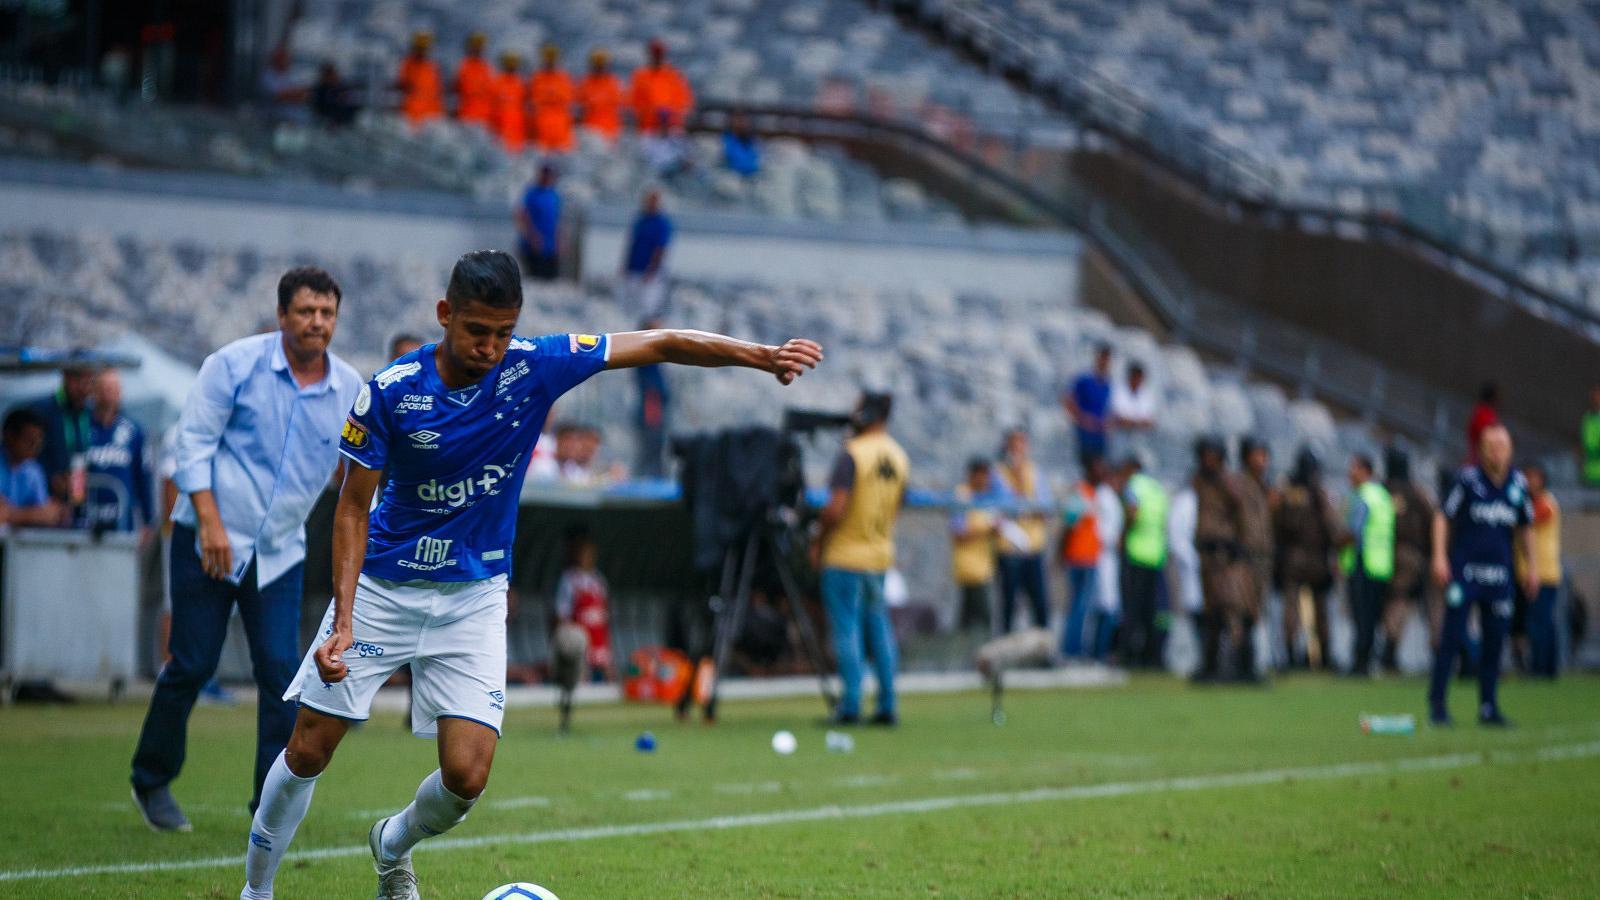 Com Queda Do Cruzeiro So Tres Clubes Considerados Gigantes Do Brasil Nunca Cairam Para Serie B Jogada Diario Do Nordeste